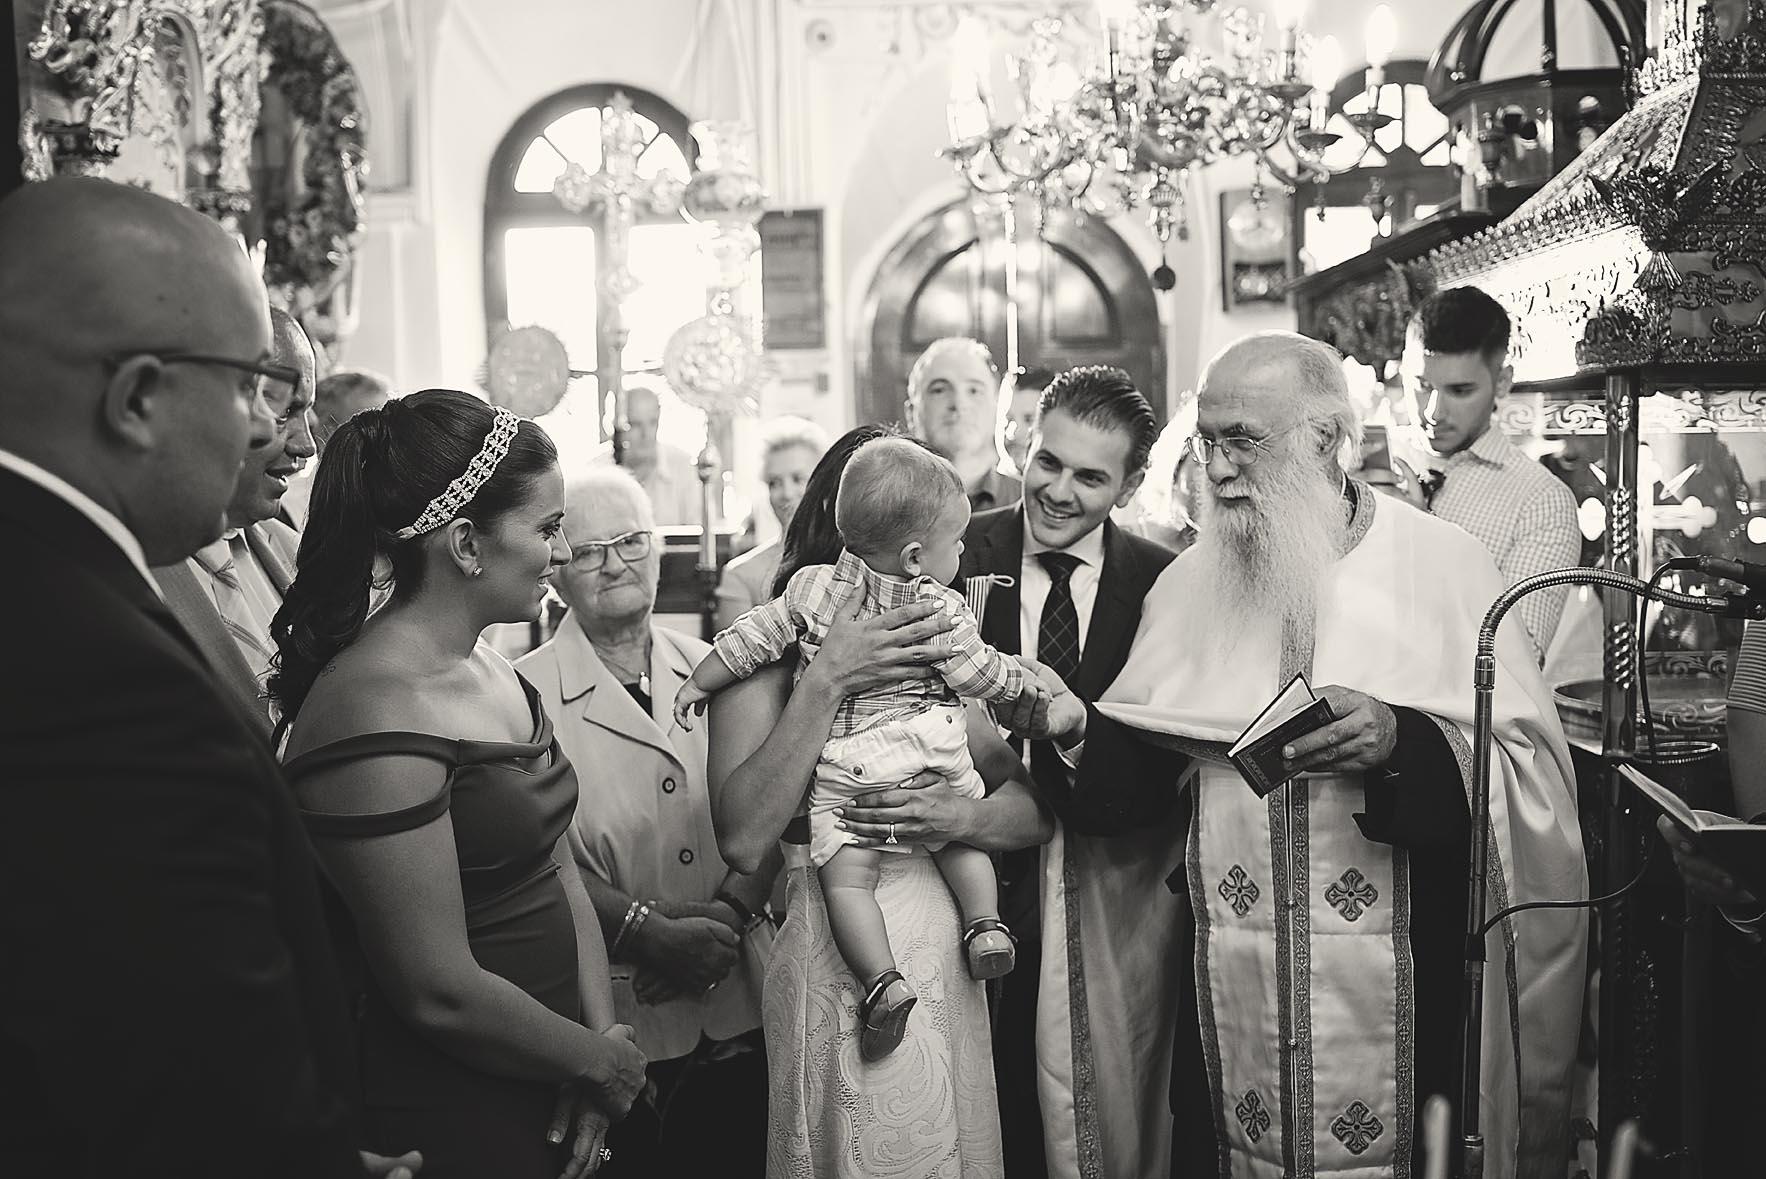 panagia-siriotissa-kampos-chios-christening-baptism-alexis-koumaditis-photography-05